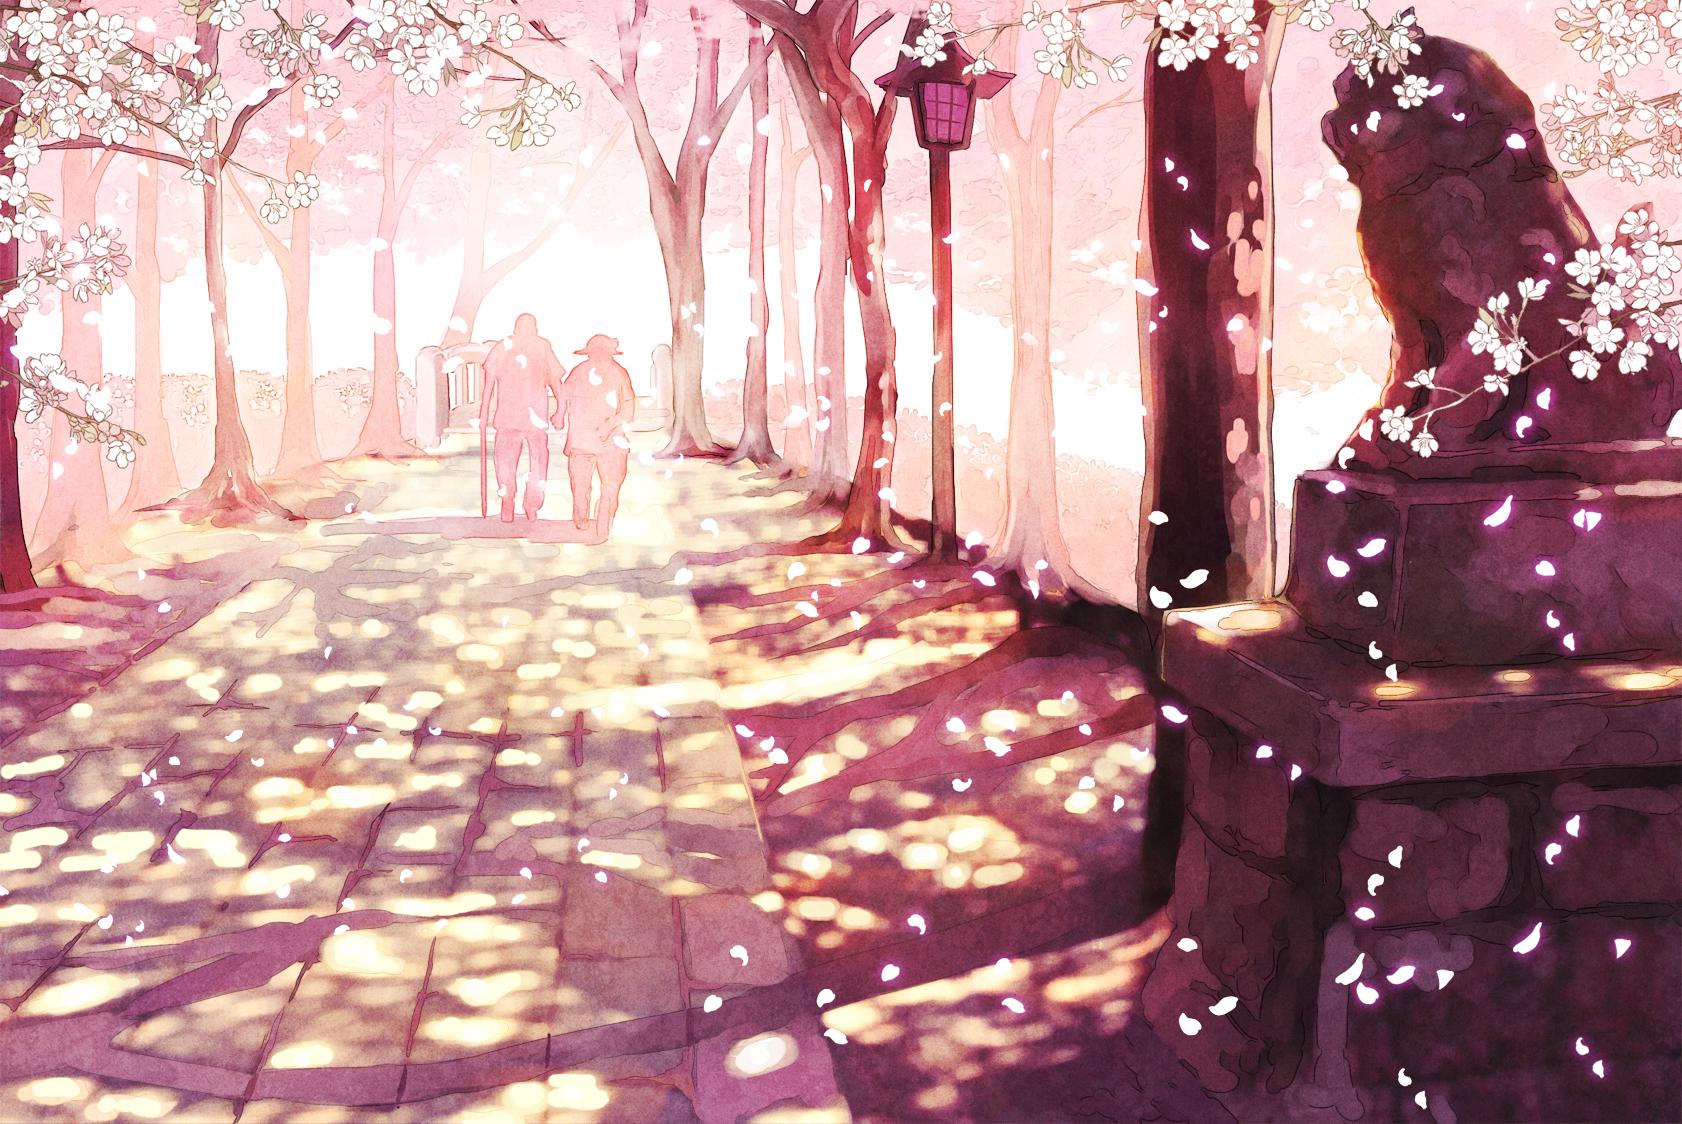 cherry blossoms furai original petals scenic tree wallpaper background 1682x1124